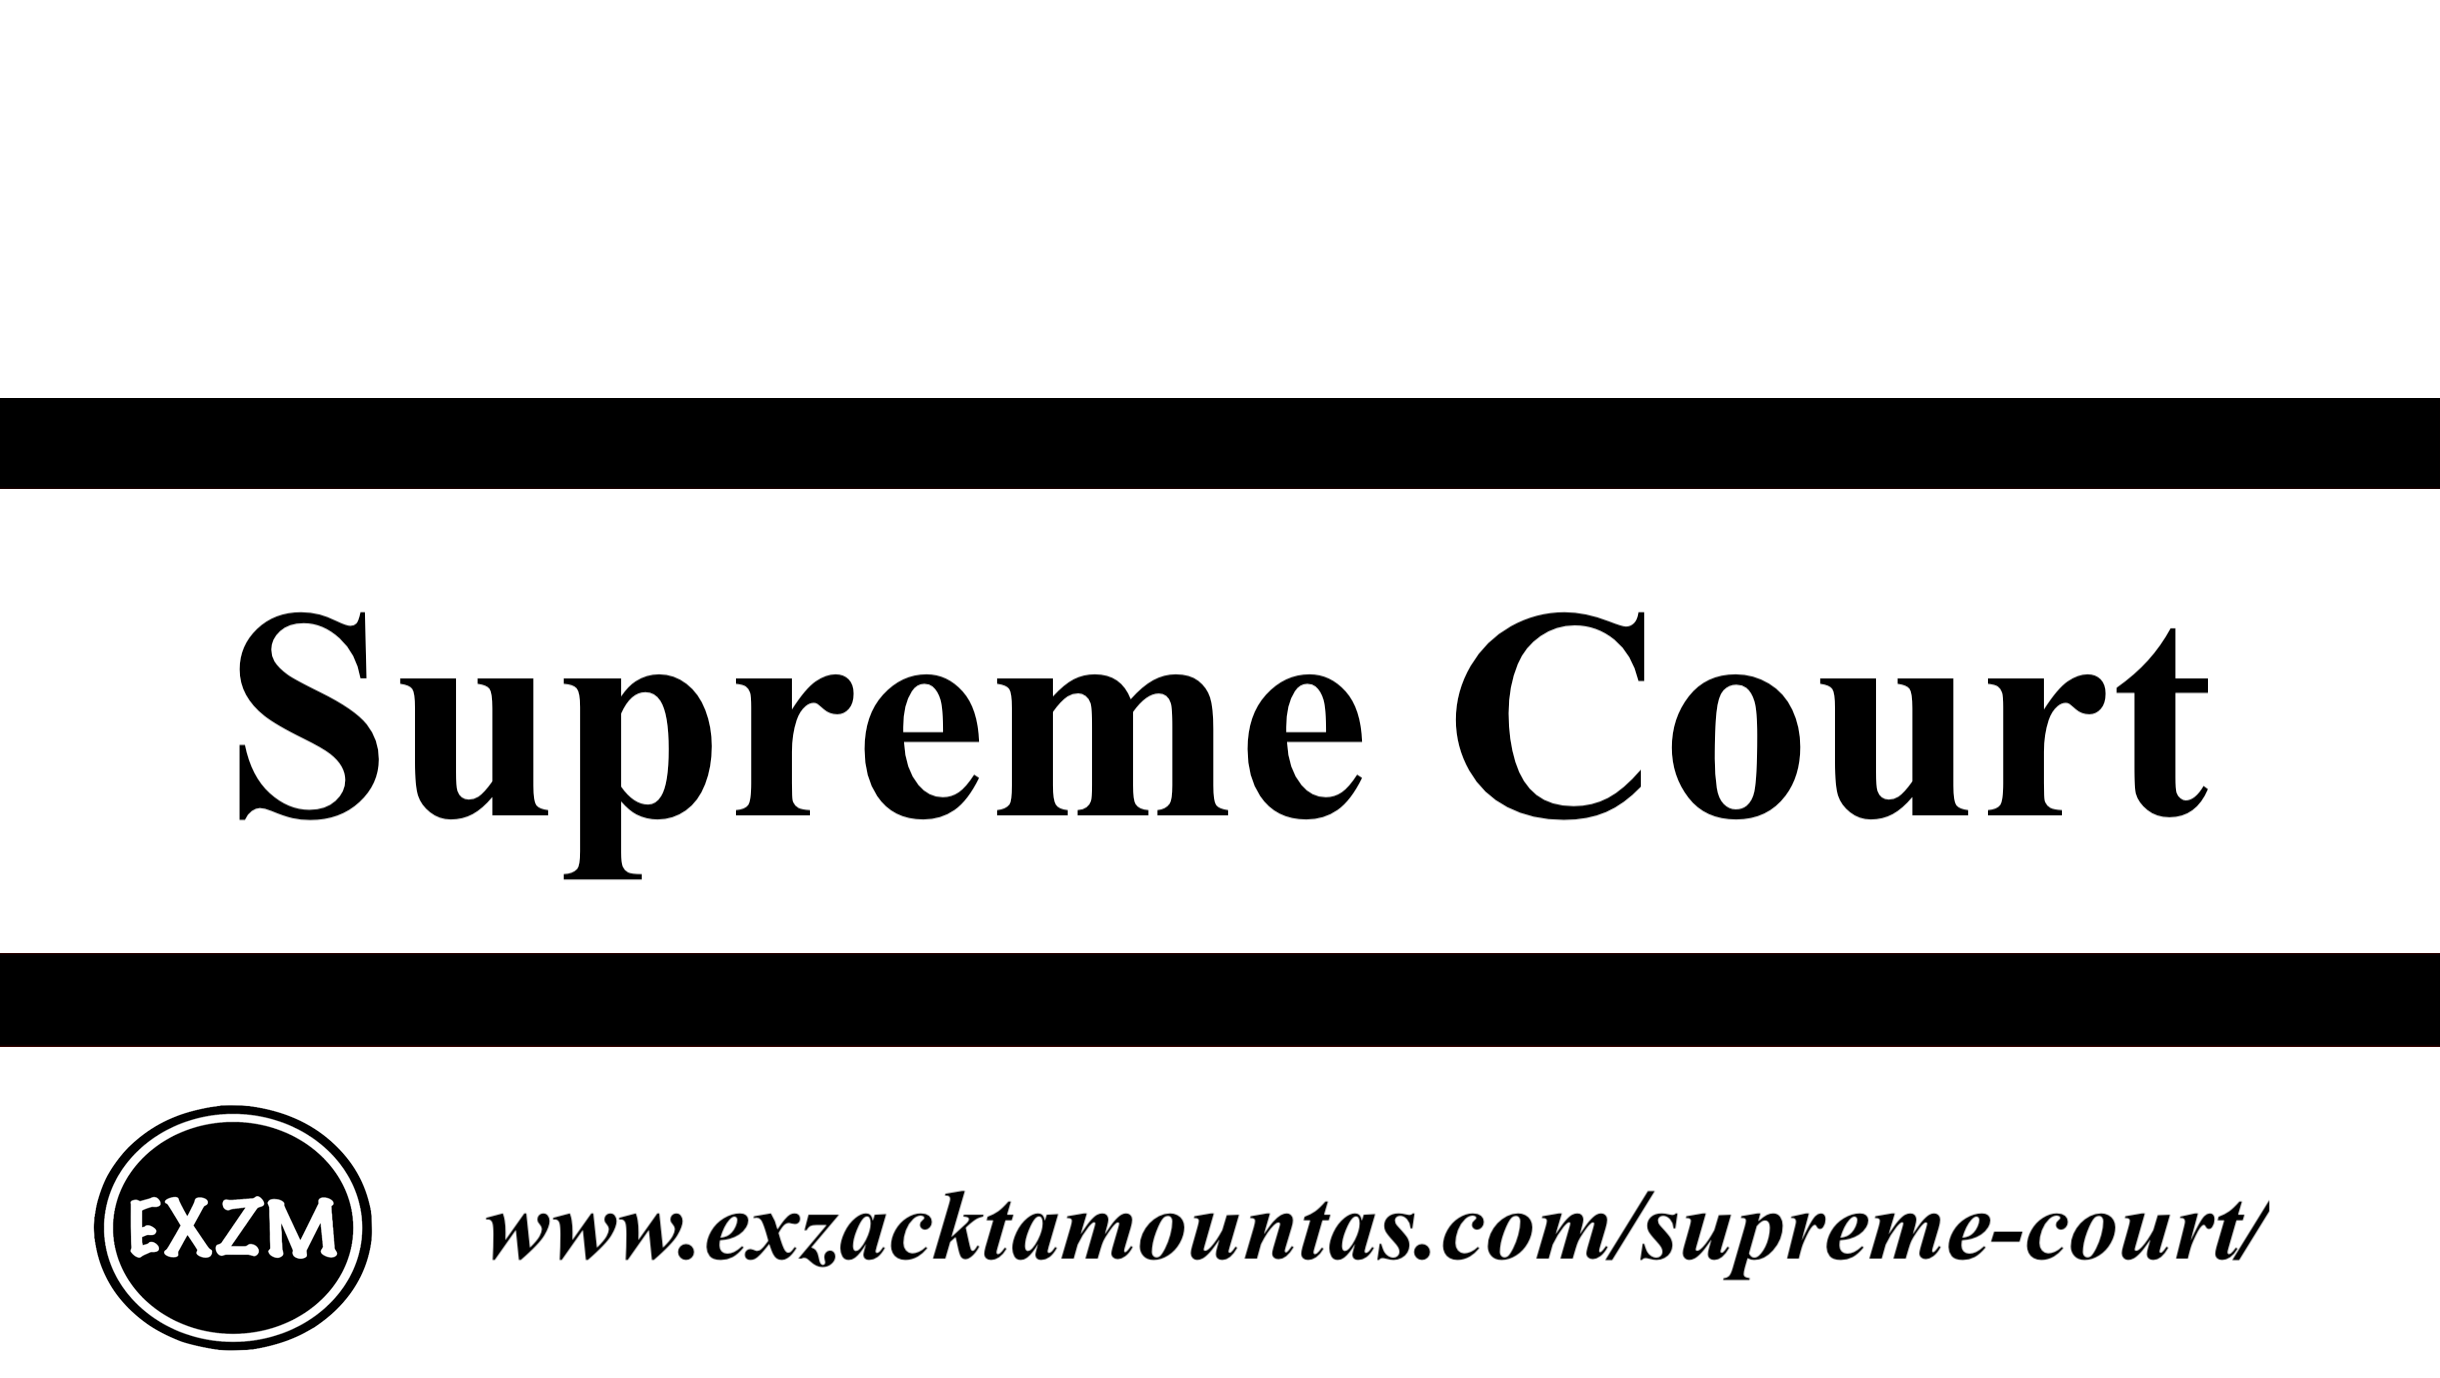 Supreme Court EXZM 9 30 2019